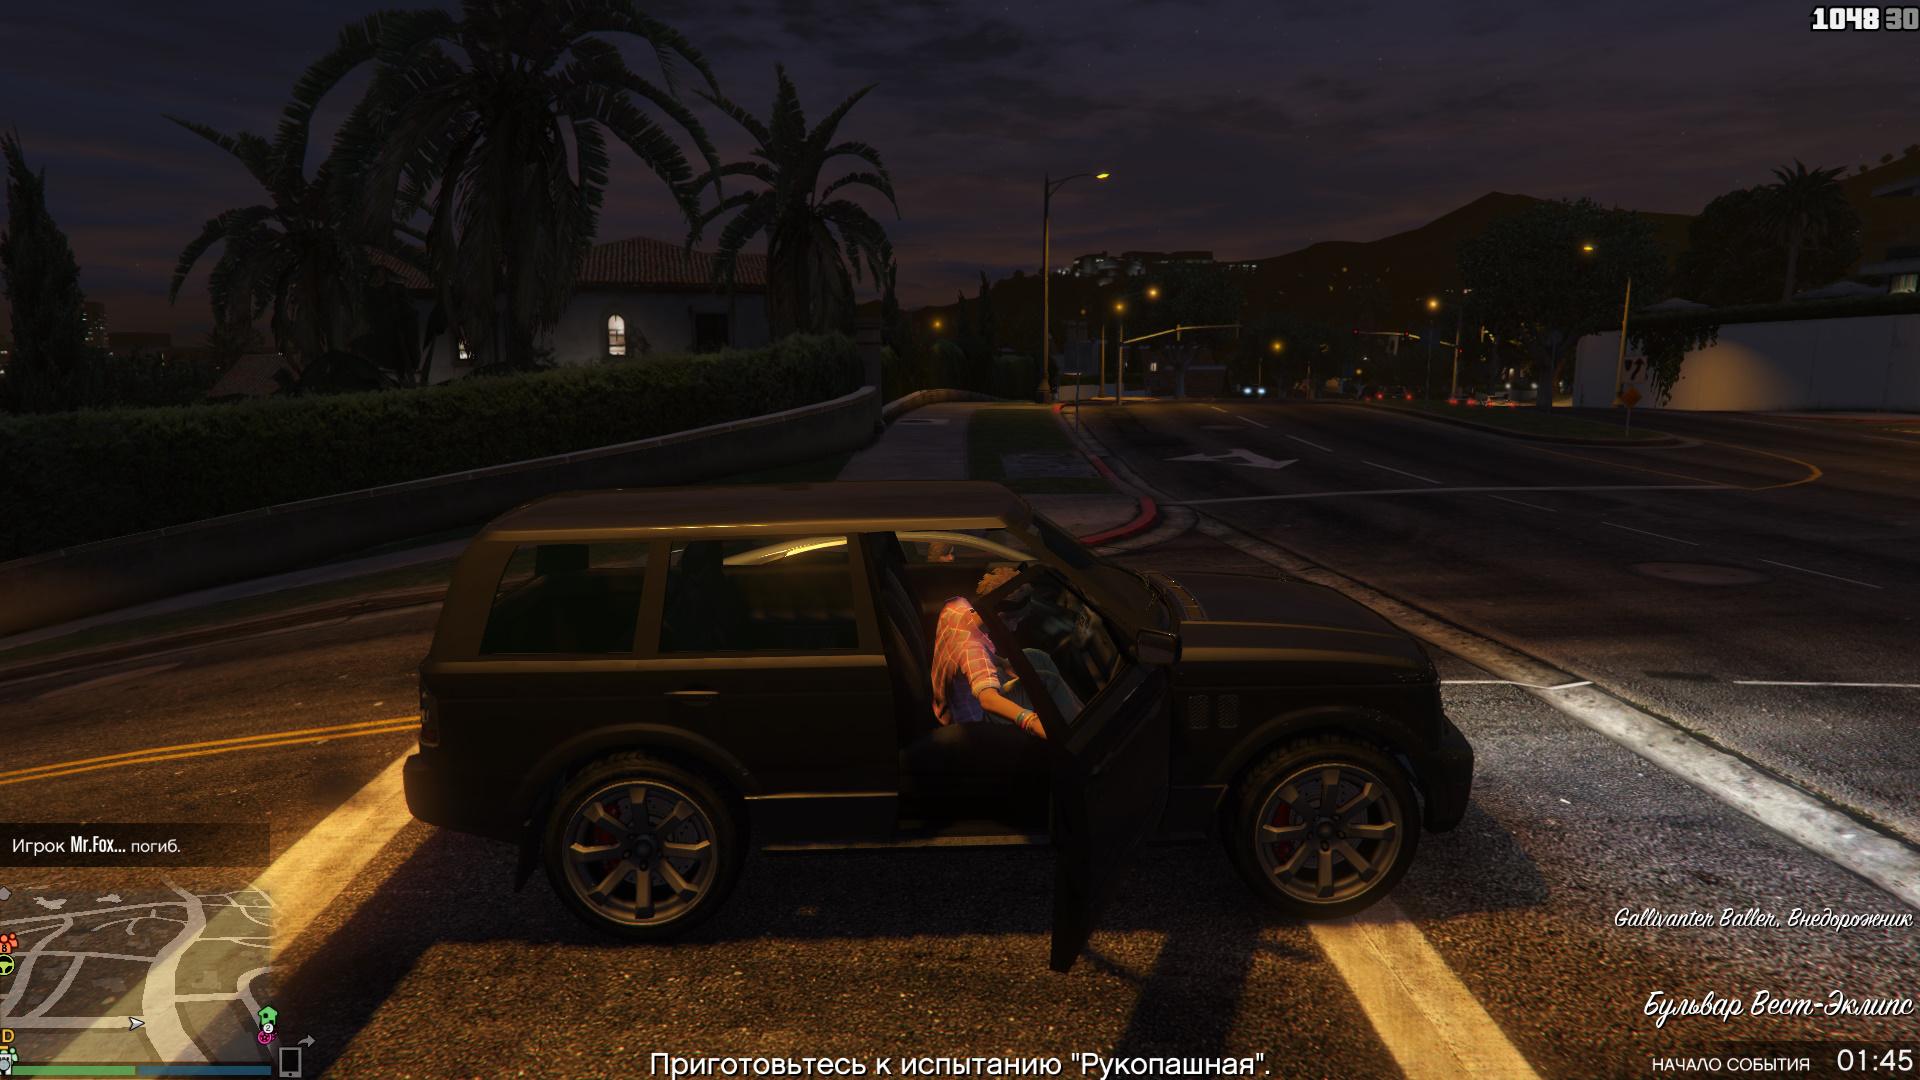 GTA5 2017-05-30 14-56-45-913.jpg - Grand Theft Auto 5